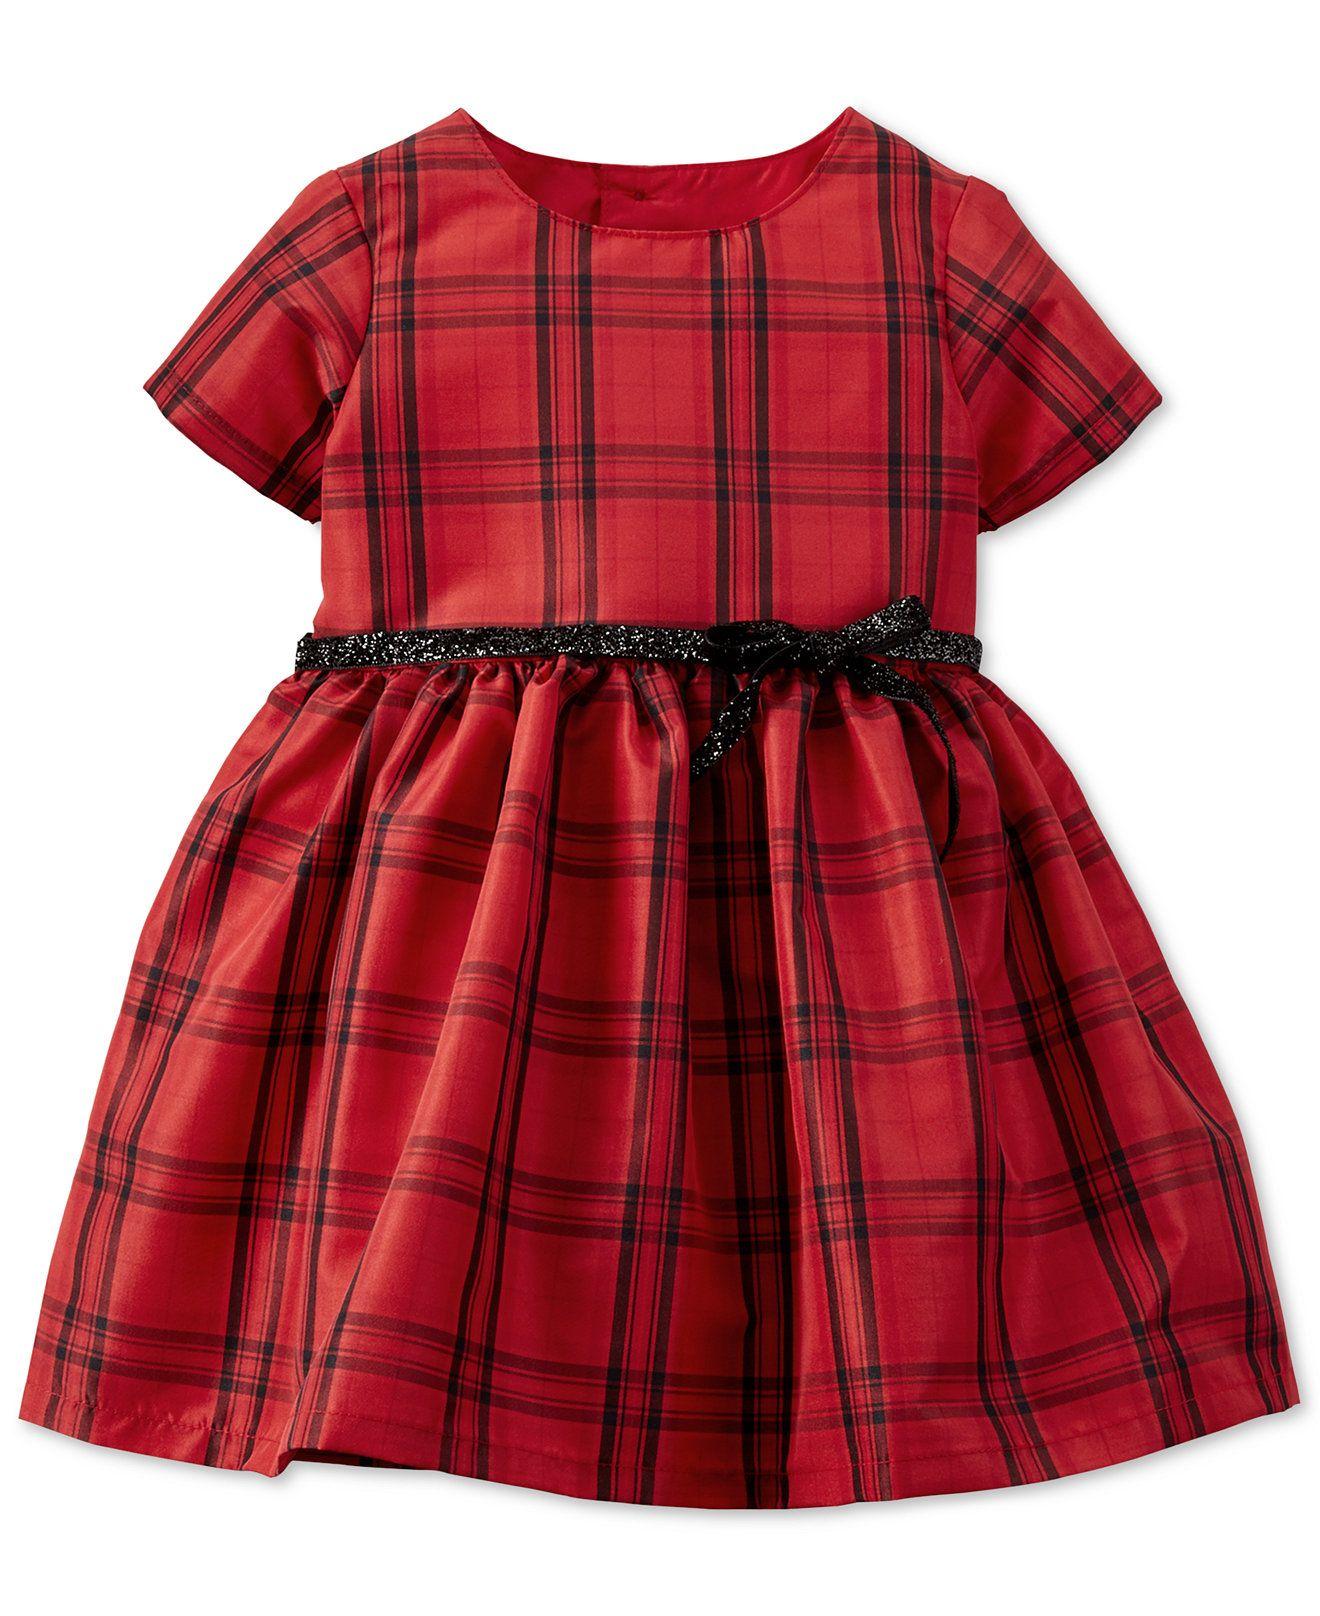 Carters baby girls red plaid taffeta dress dresses